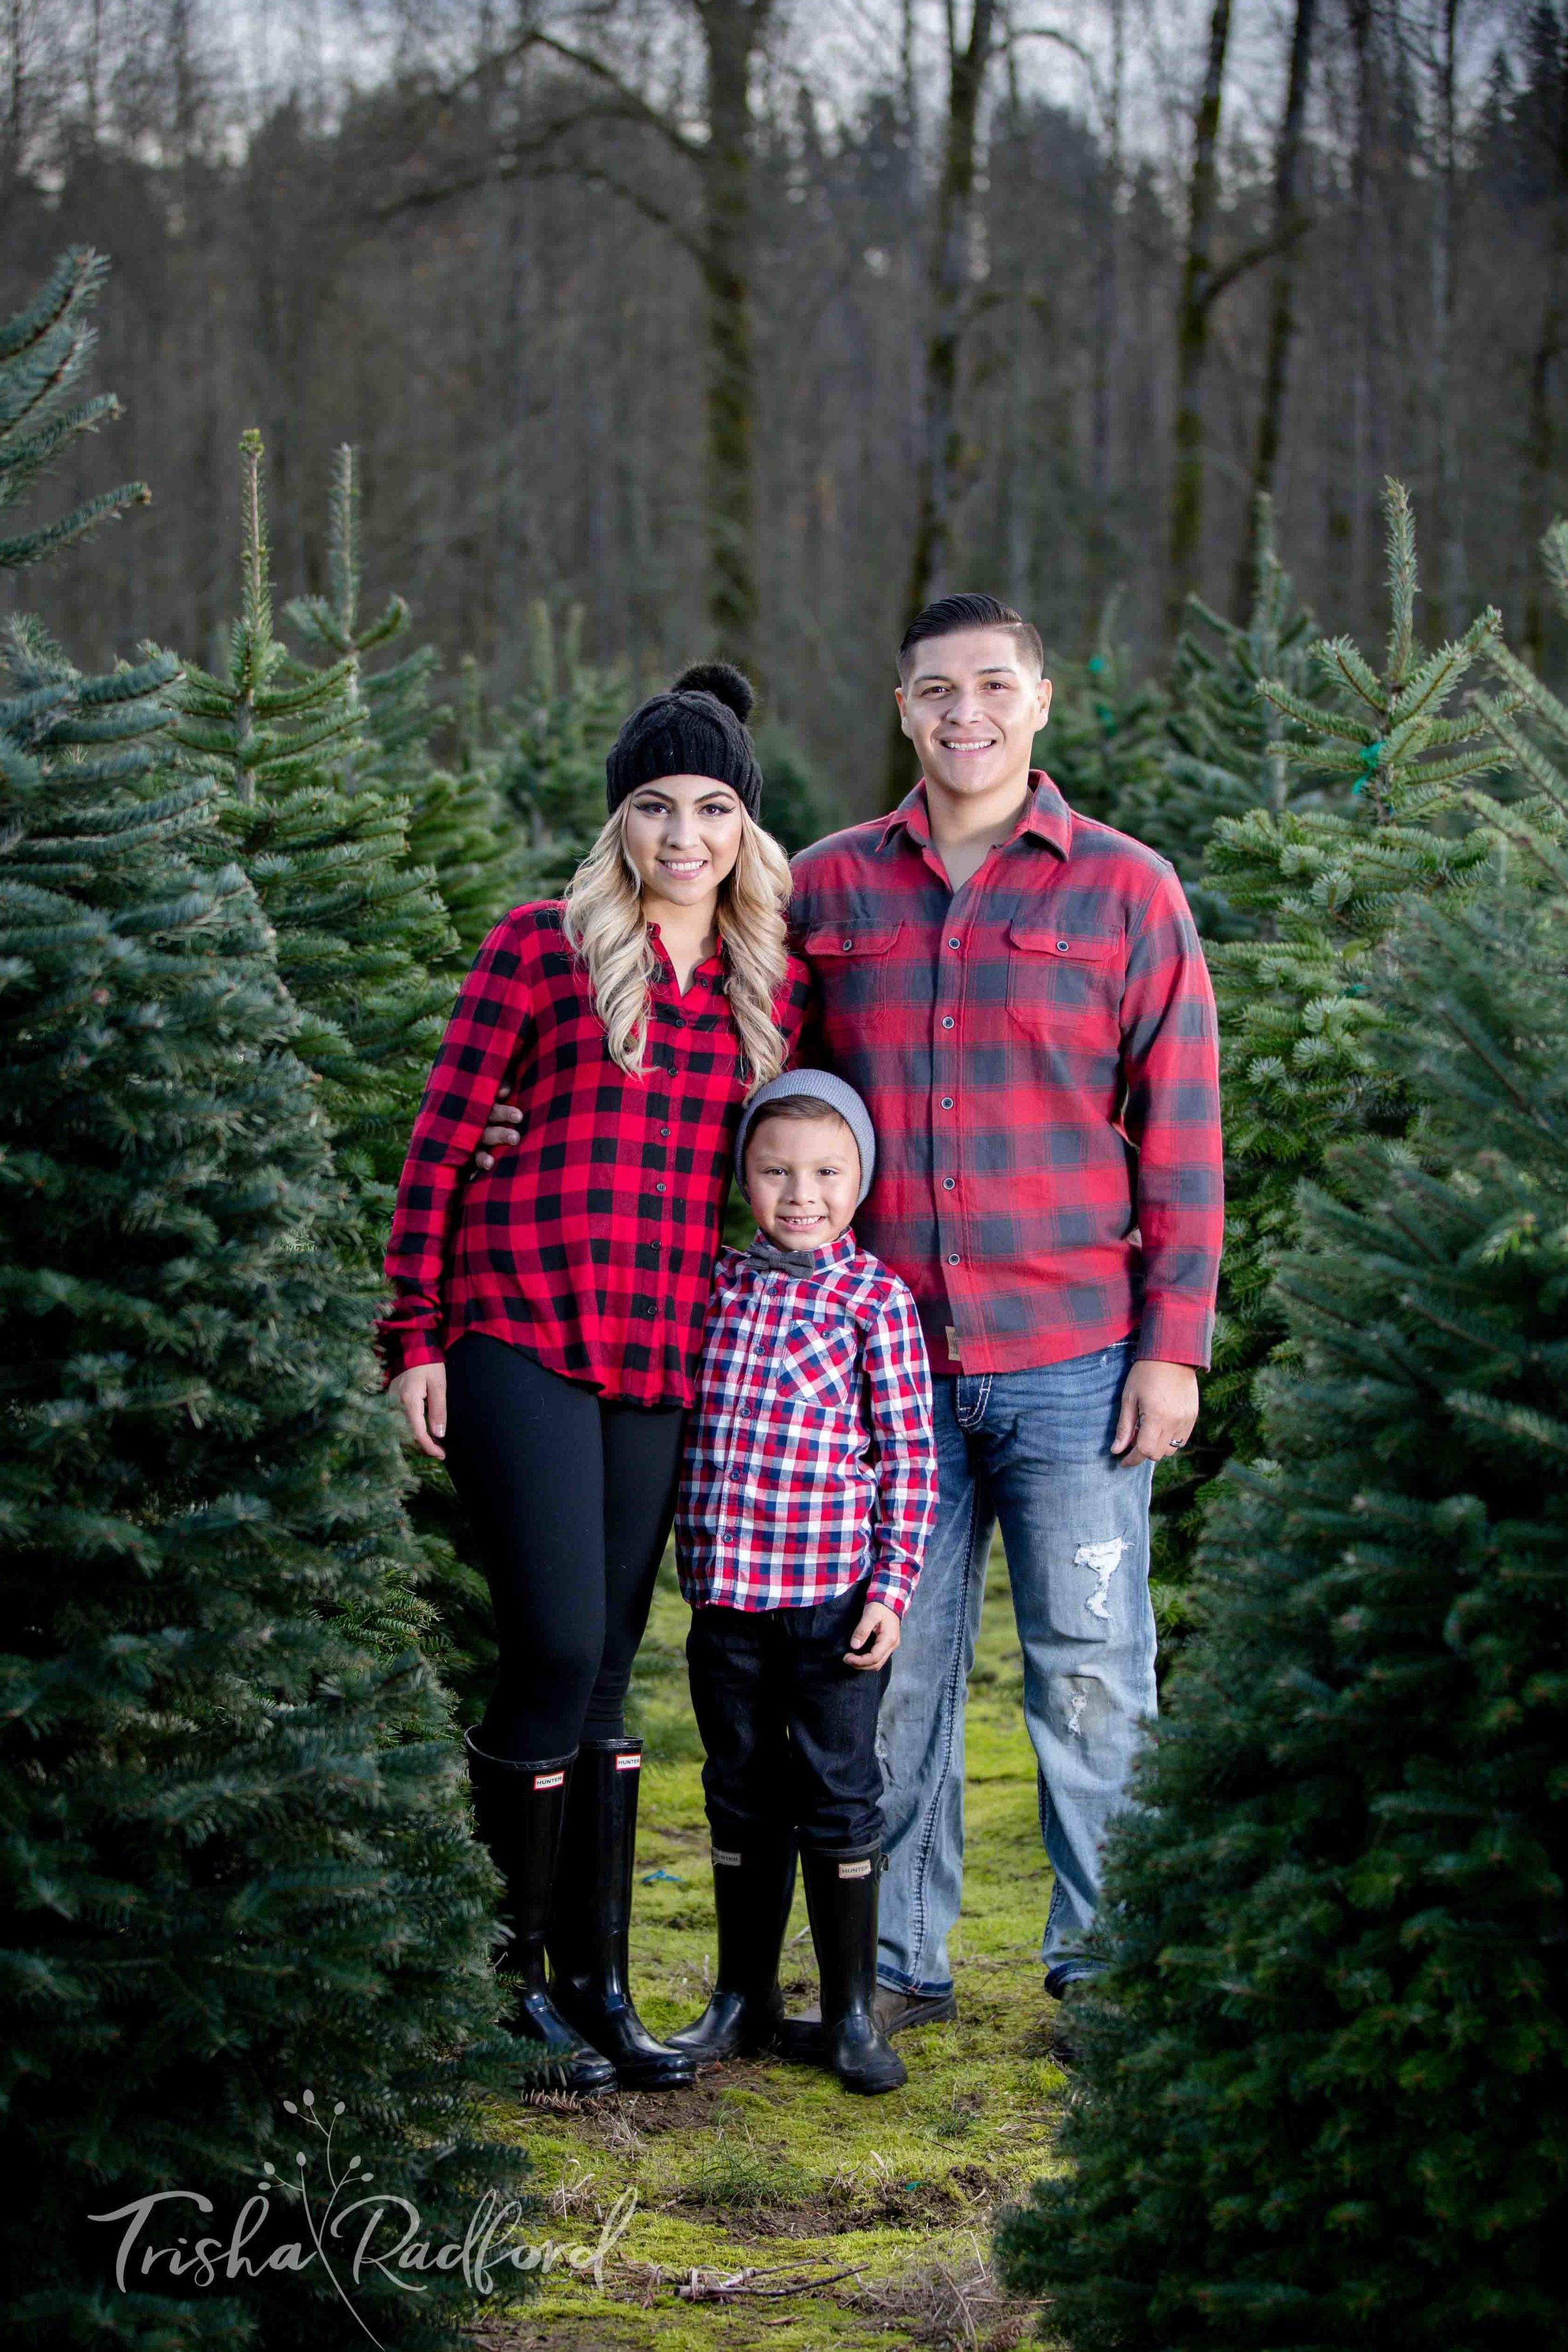 Snohomish County Family Photographer | Christmas Tree Farm Photos